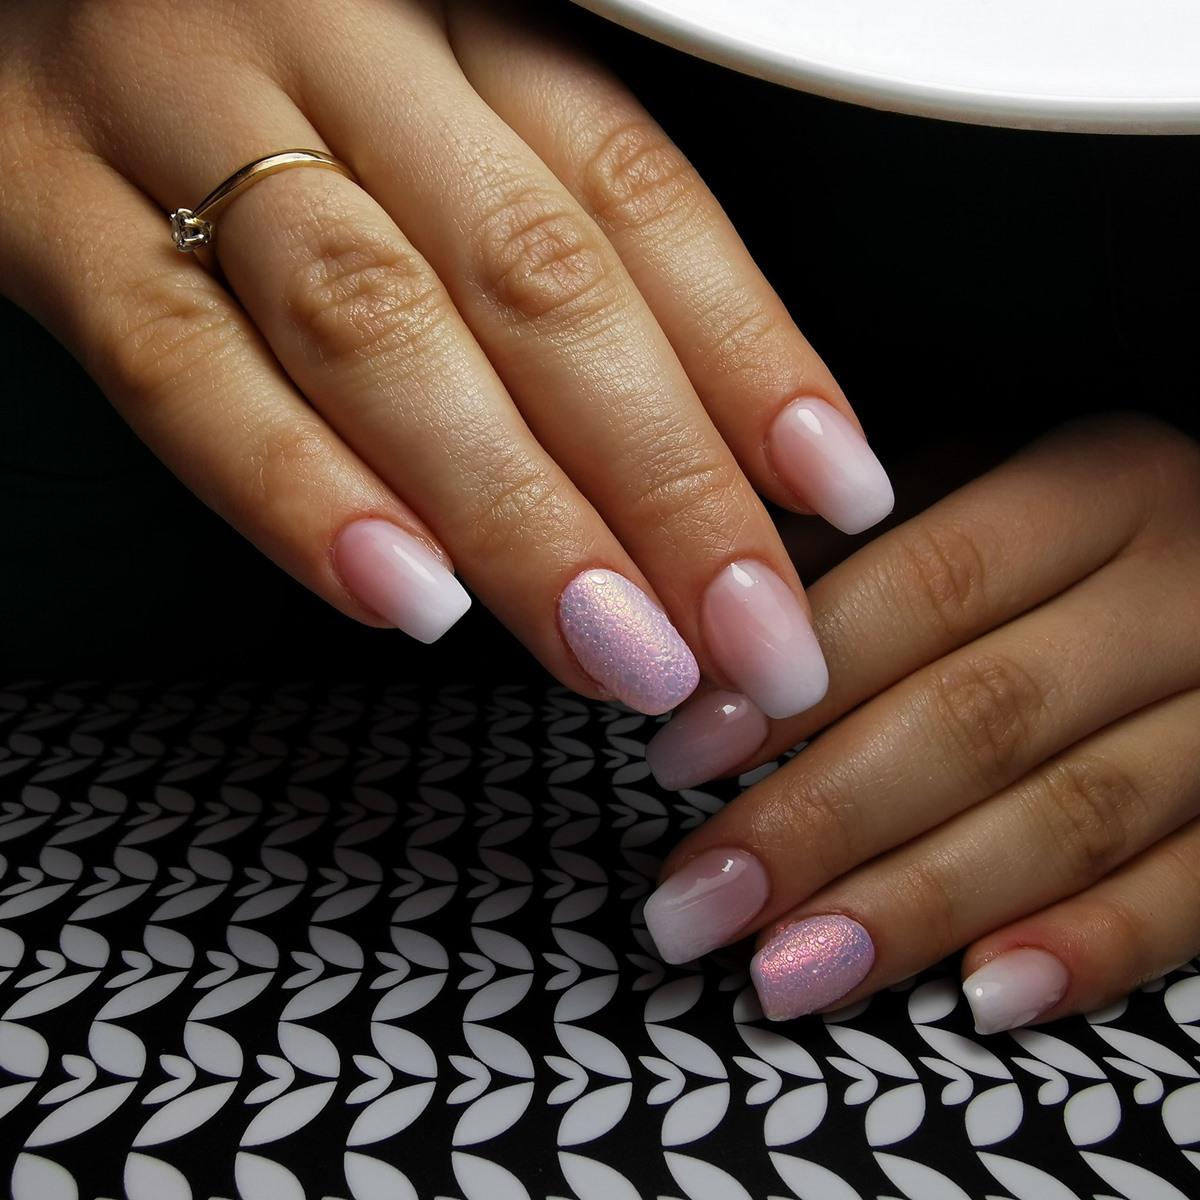 paznokcie bubble nails